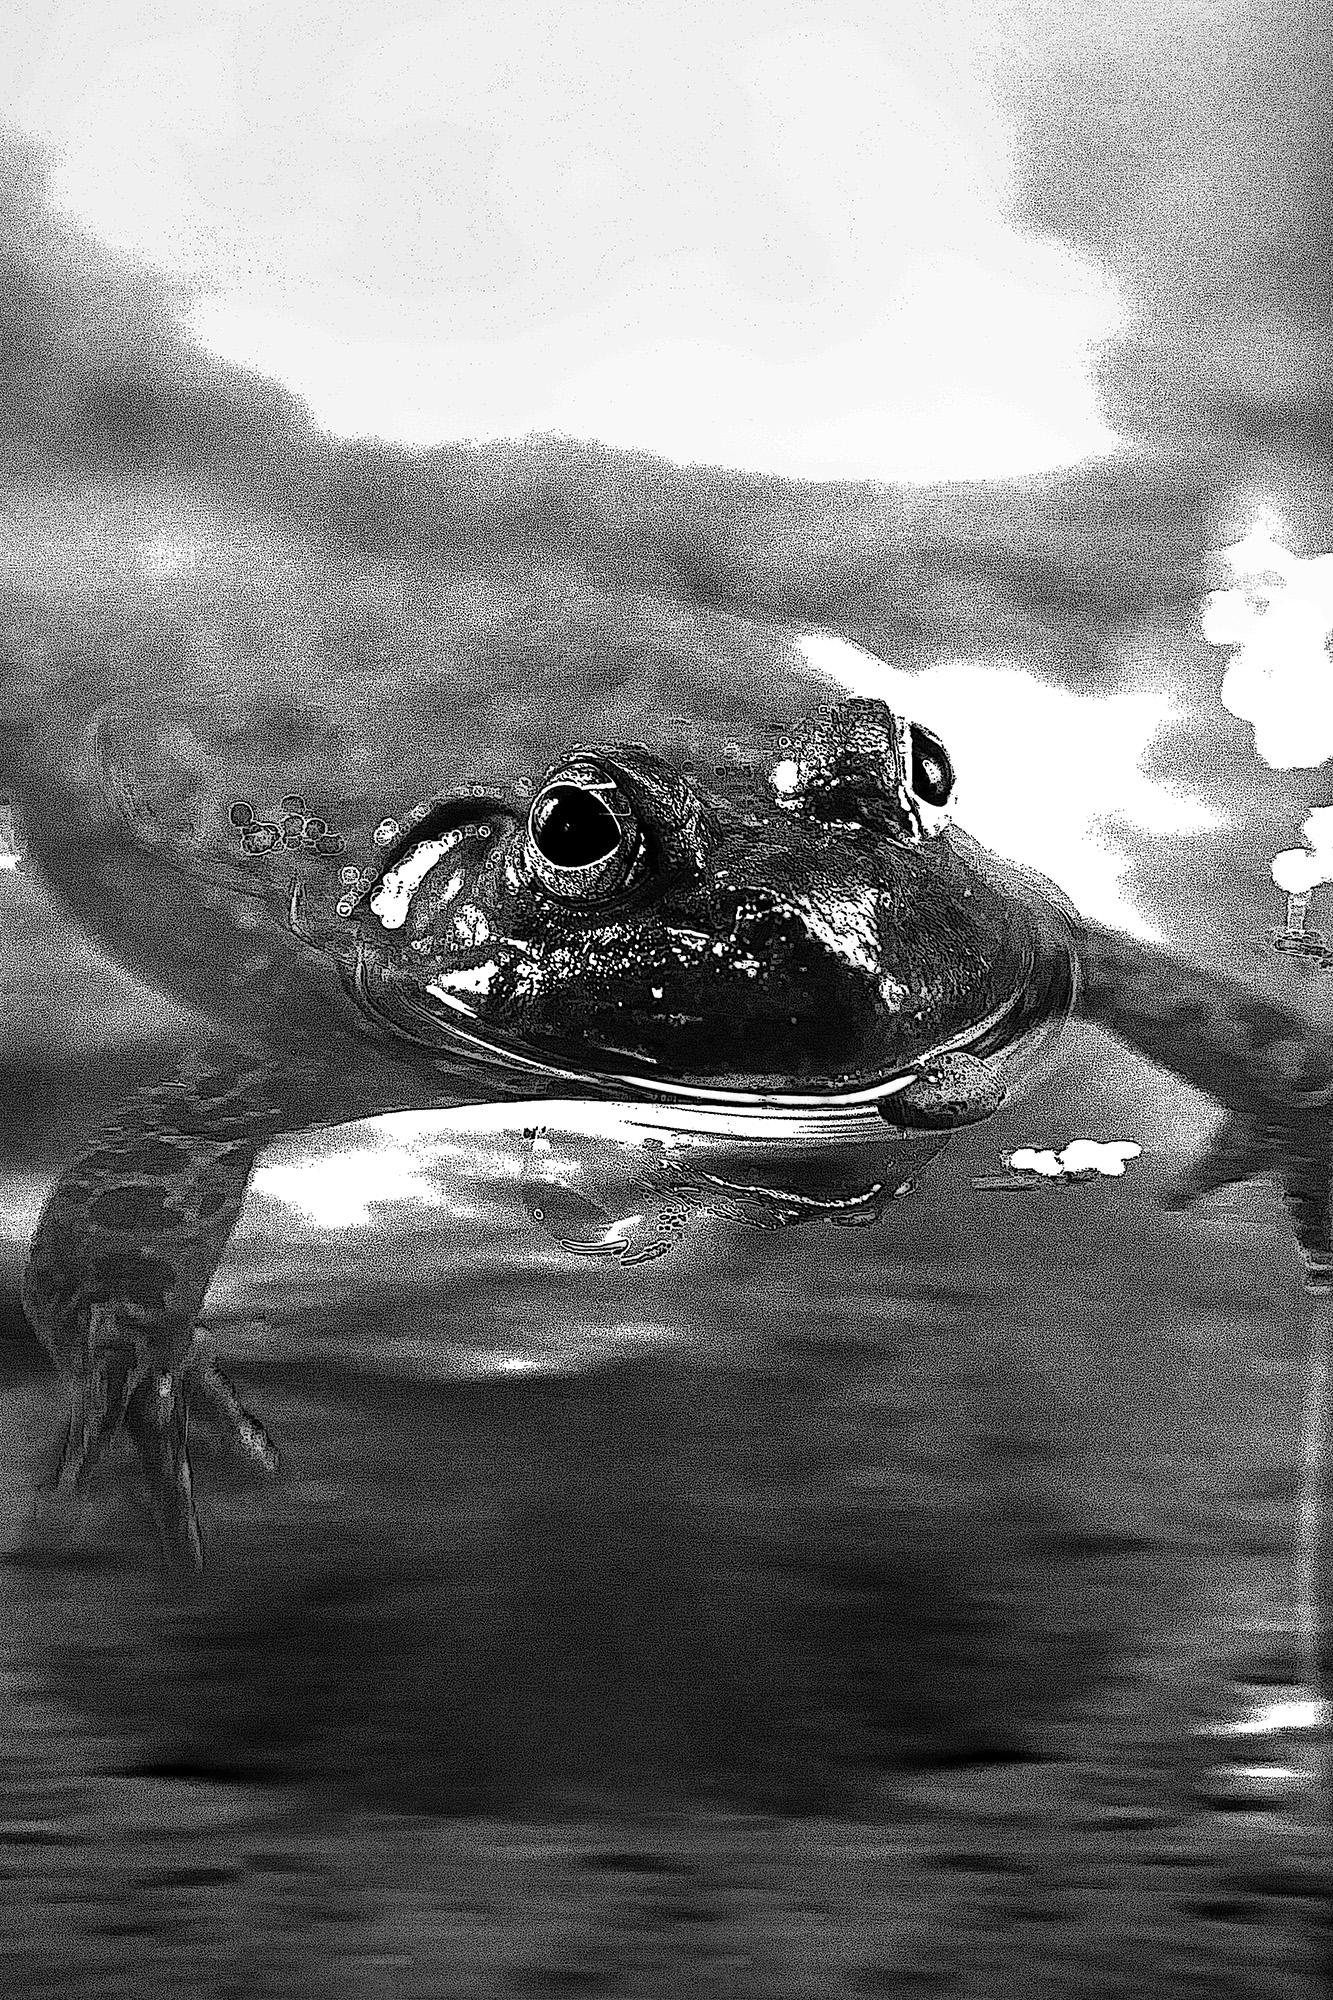 La jolie grenouille